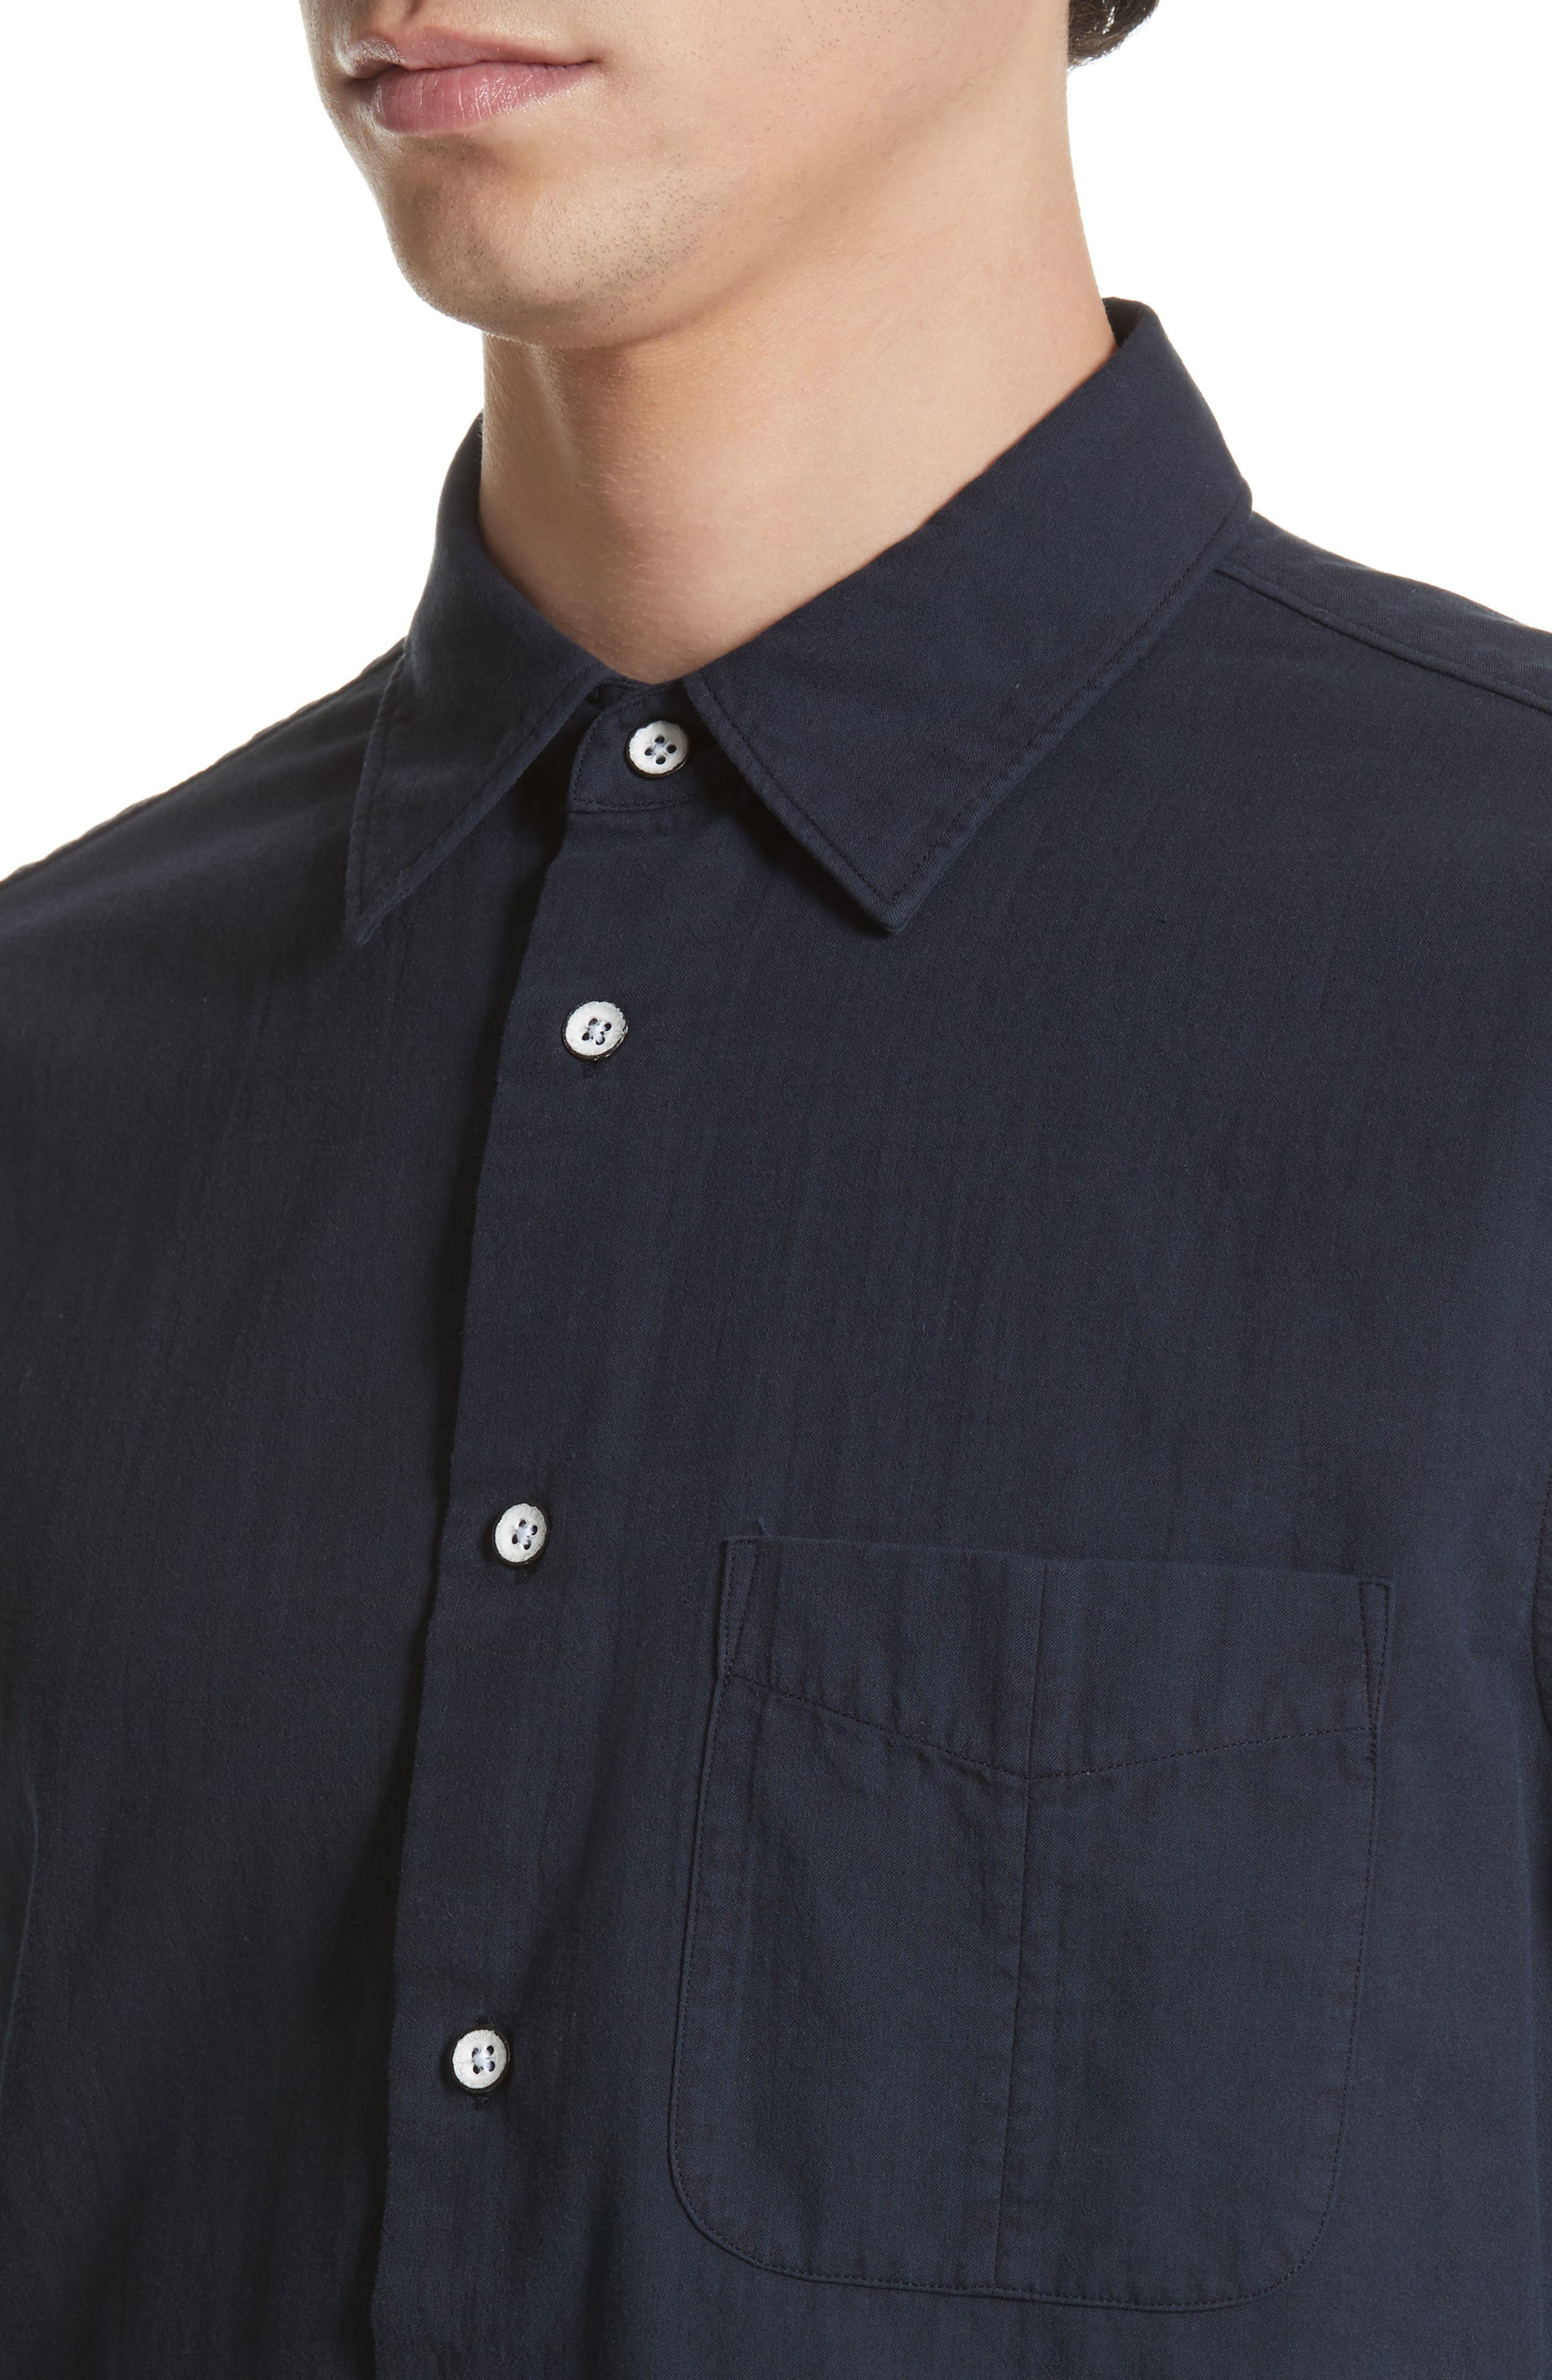 RAG & BONE, Standard Issue Solid Sport Shirt, Alternate thumbnail 5, color, 410